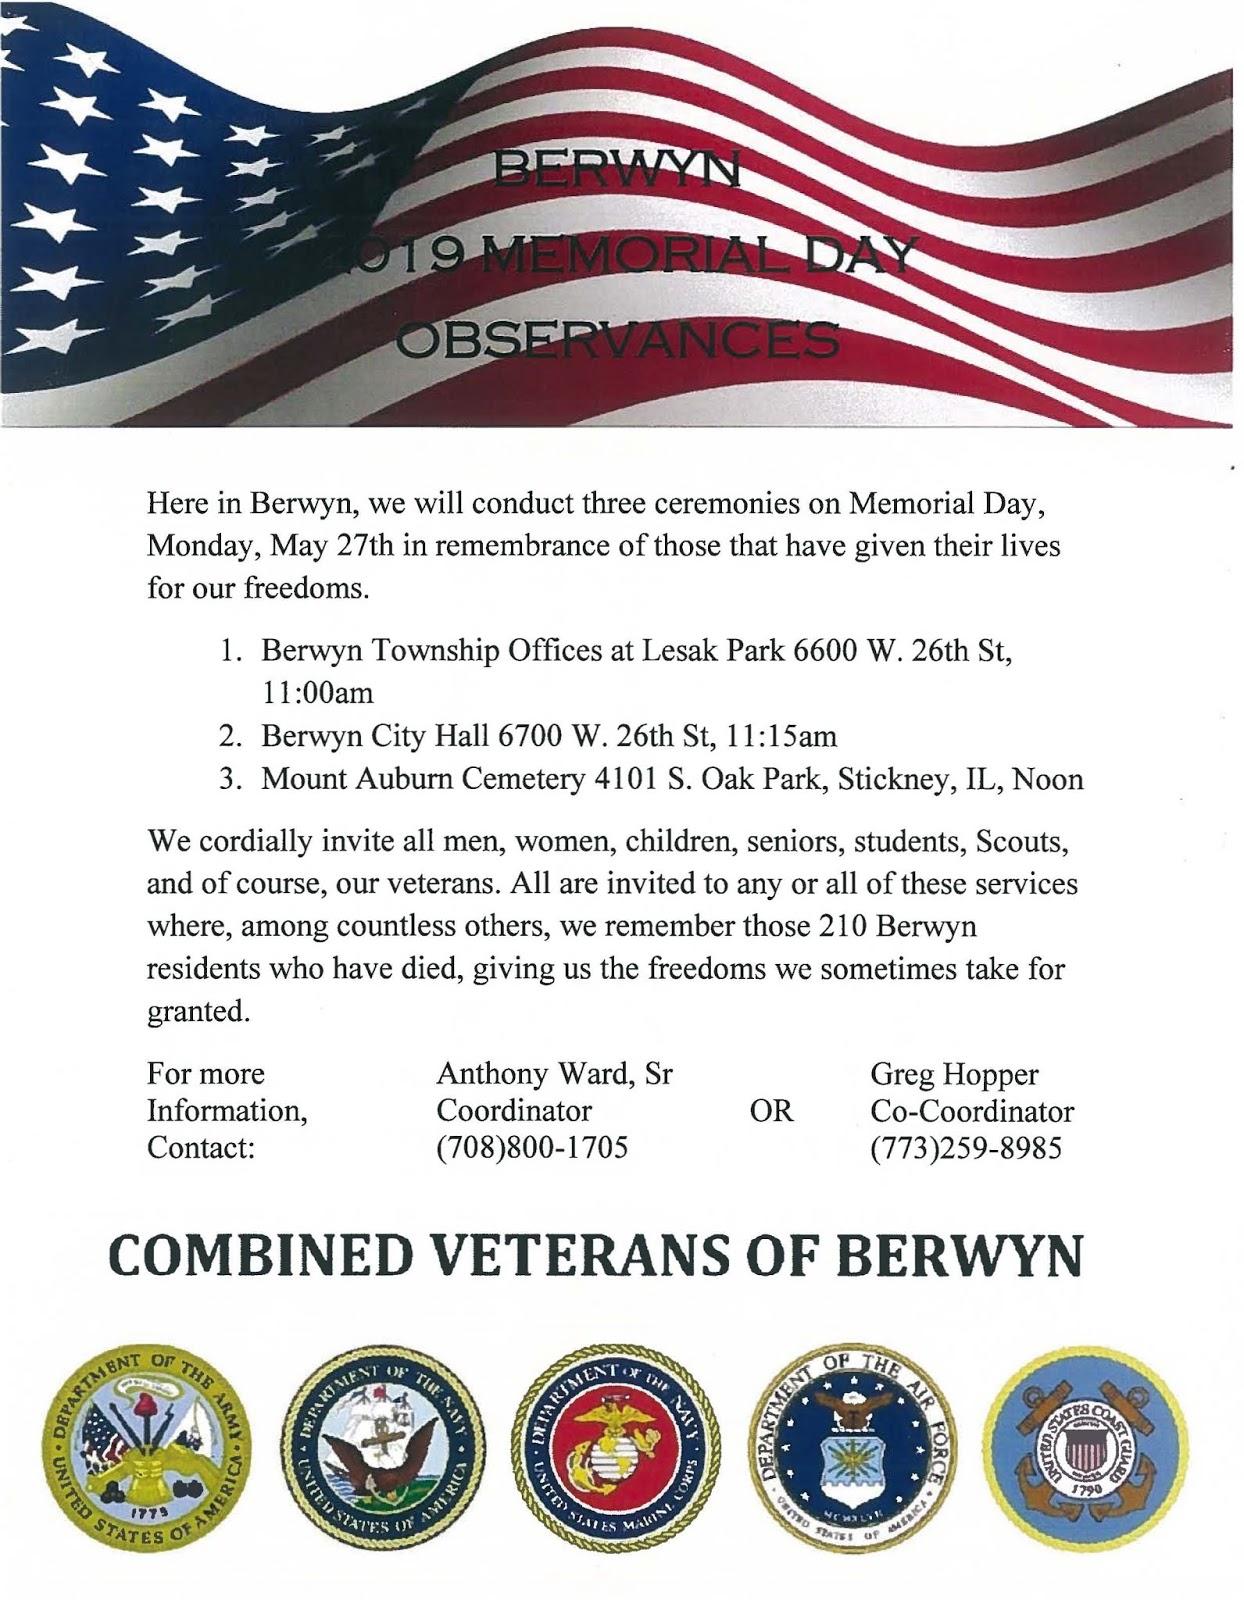 db32bca3c Welcome to City of Berwyn | City of Berwyn